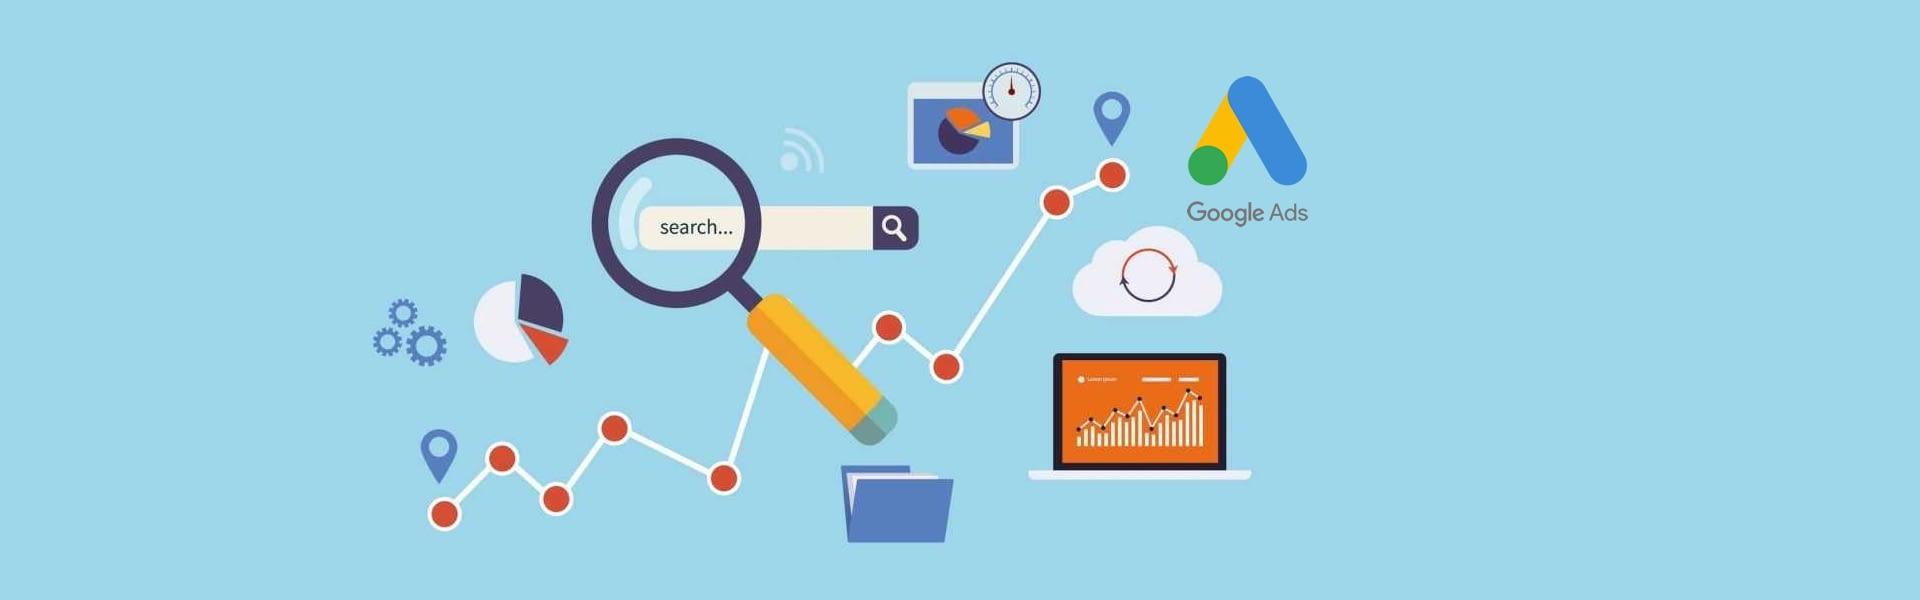 google-ads-atuarmkt-marketing-digital